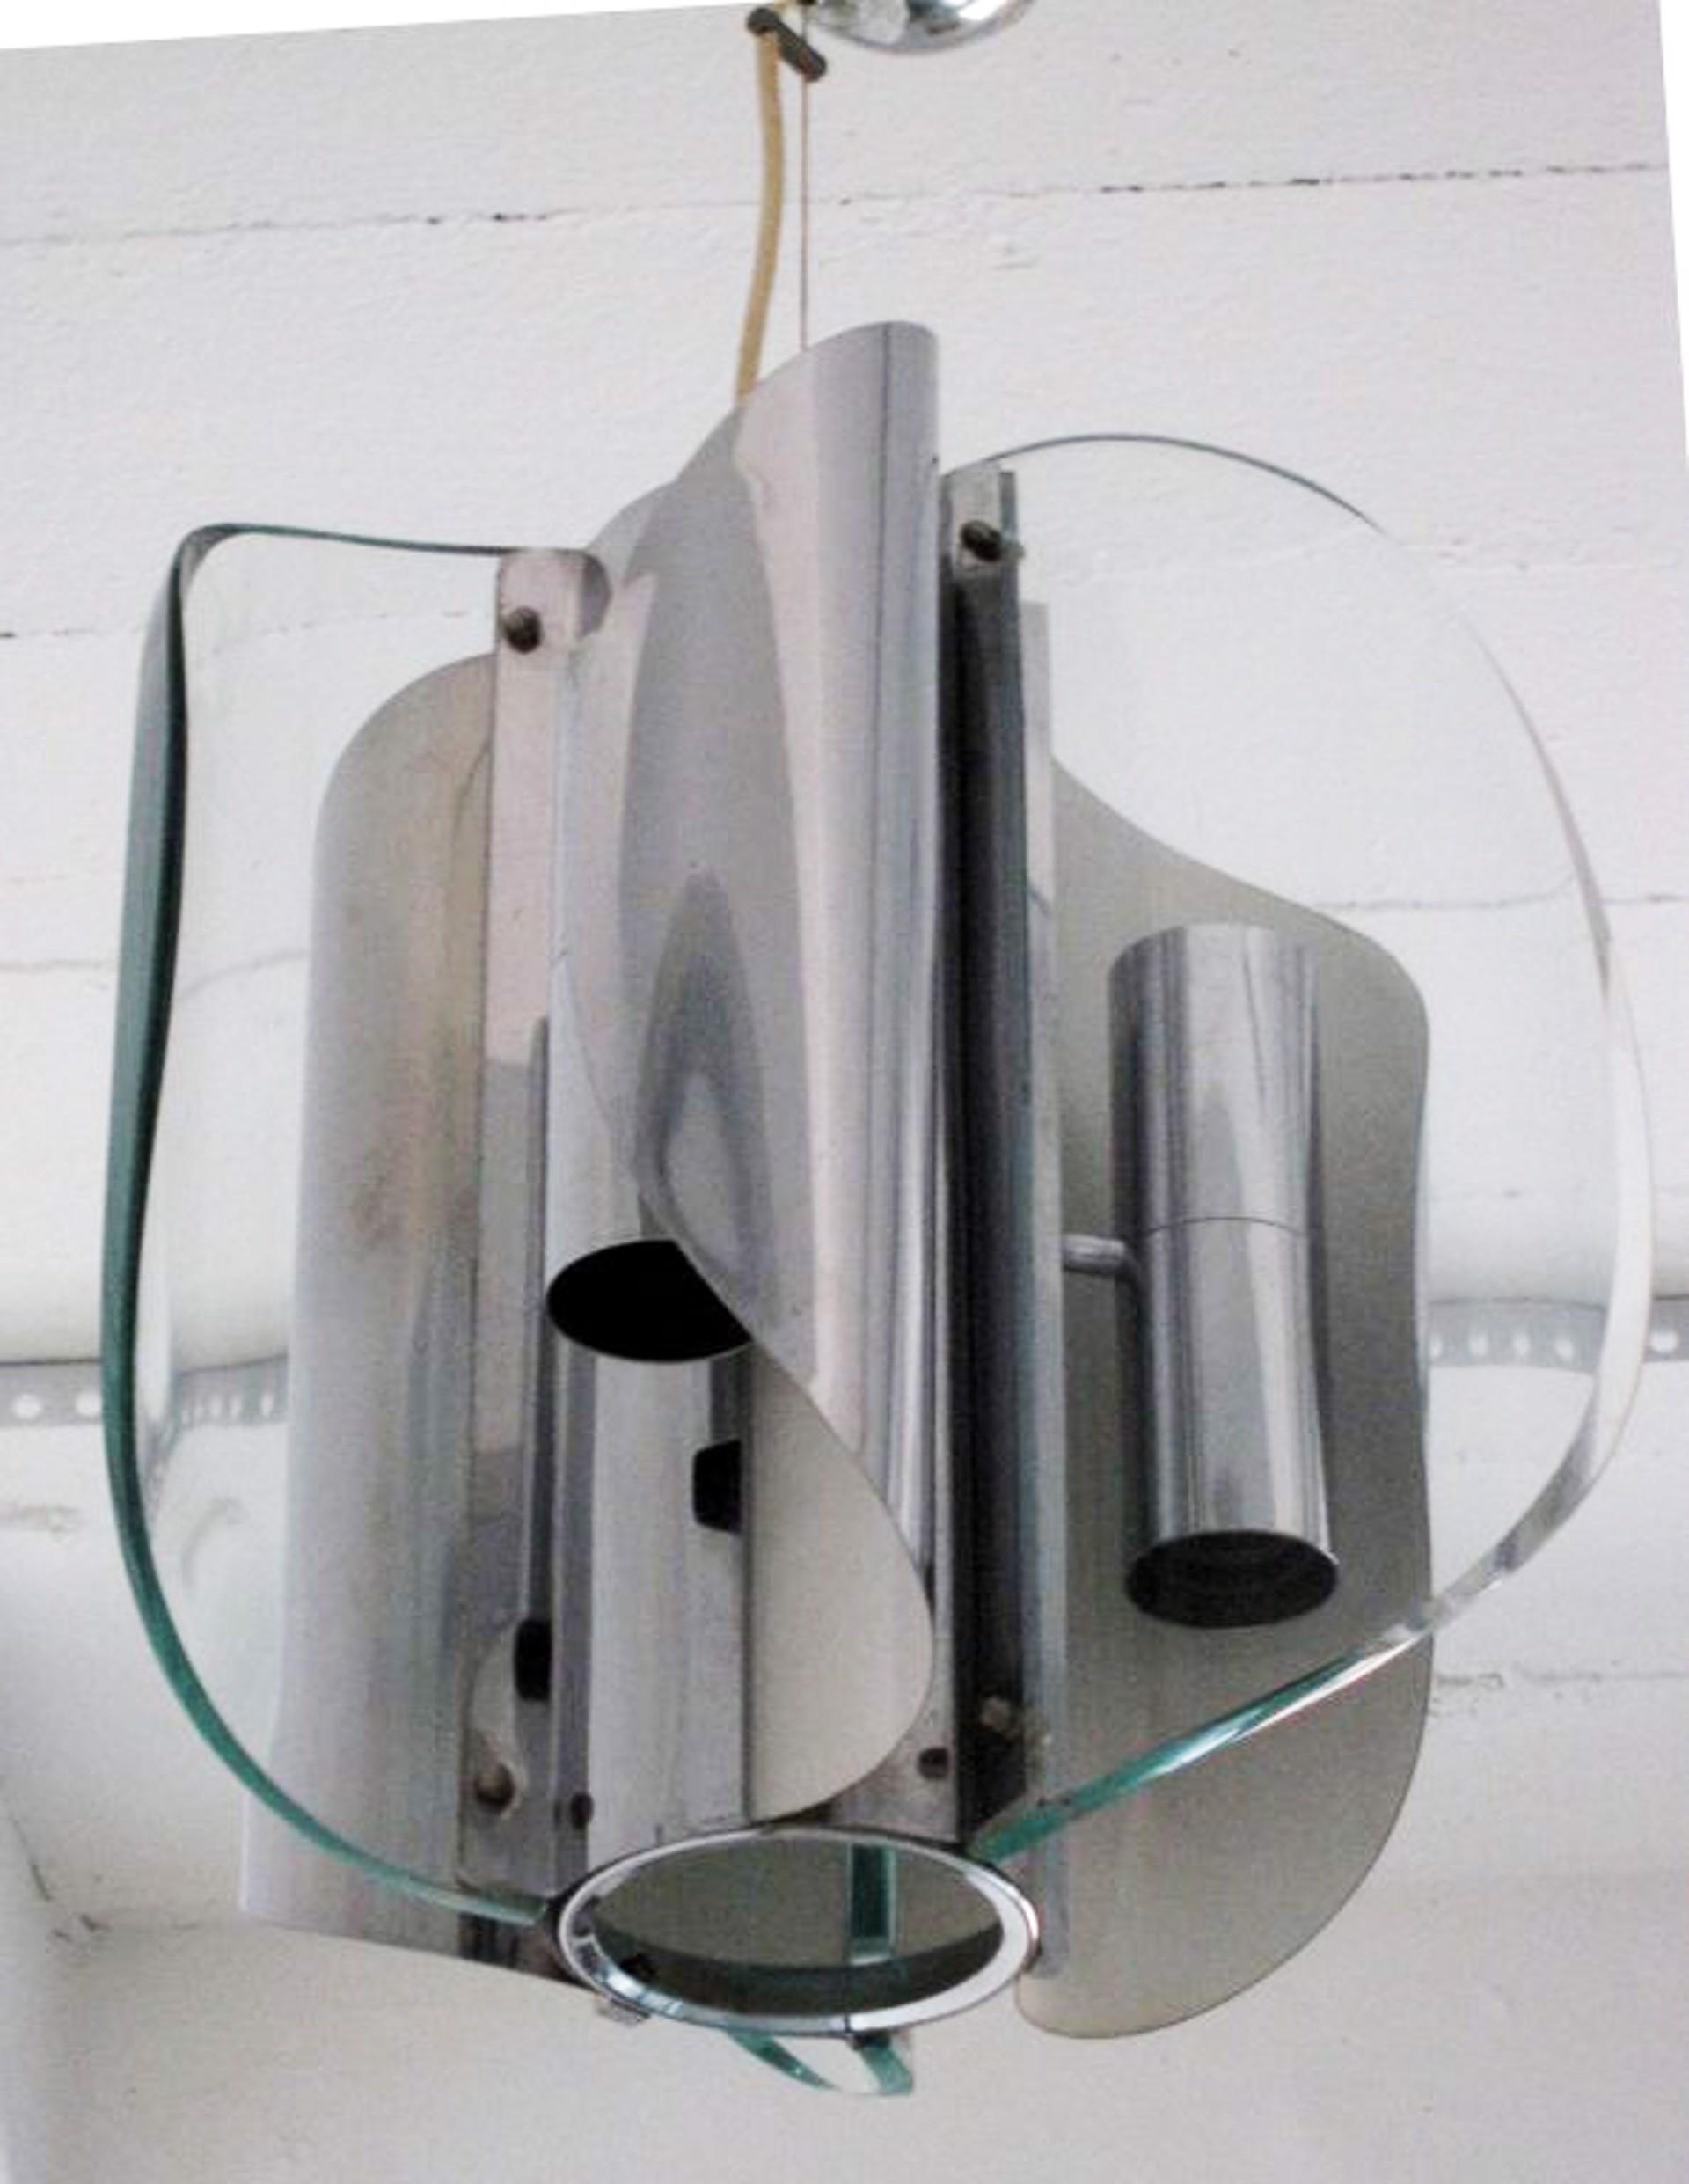 20th Century Chandelier by Fontana Arte